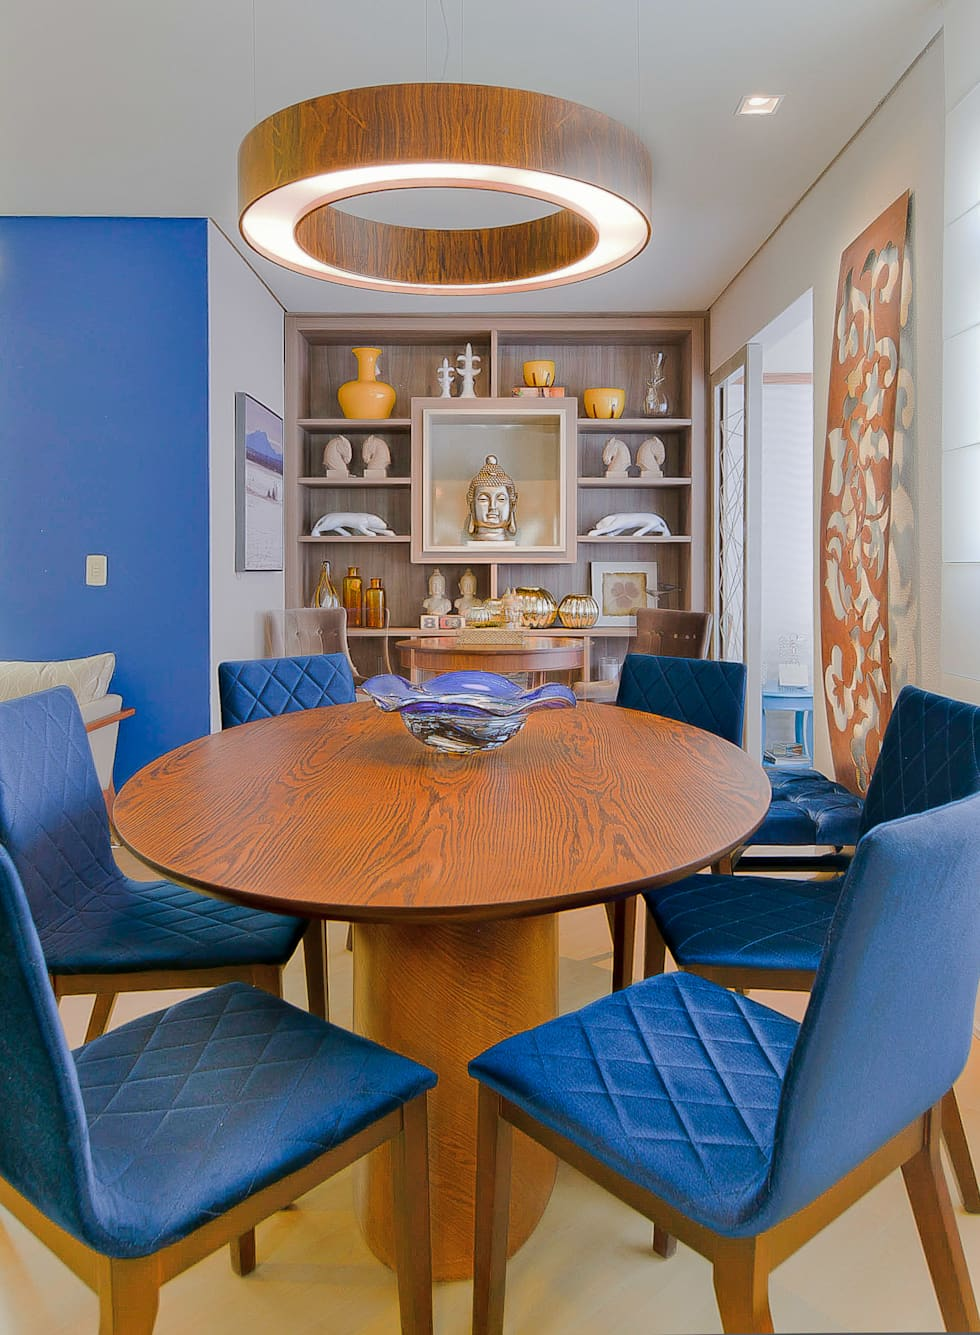 Fotos De Decora O Design De Interiores E Reformas Homify -> Decoracao Sala De Jantar Azul